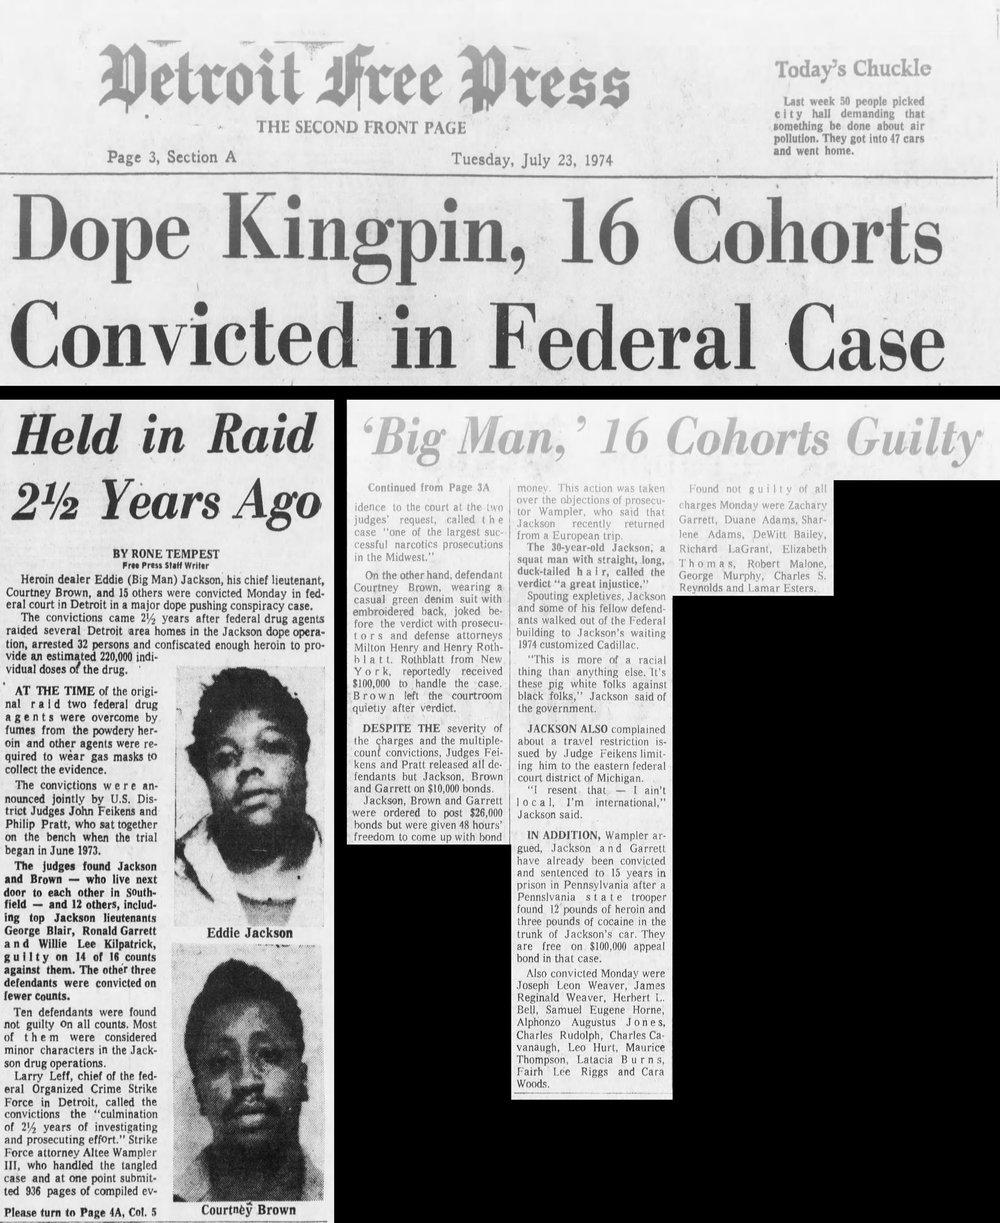 Detroit_Free_Press_Tue__Jul_23__1974_v4.jpg